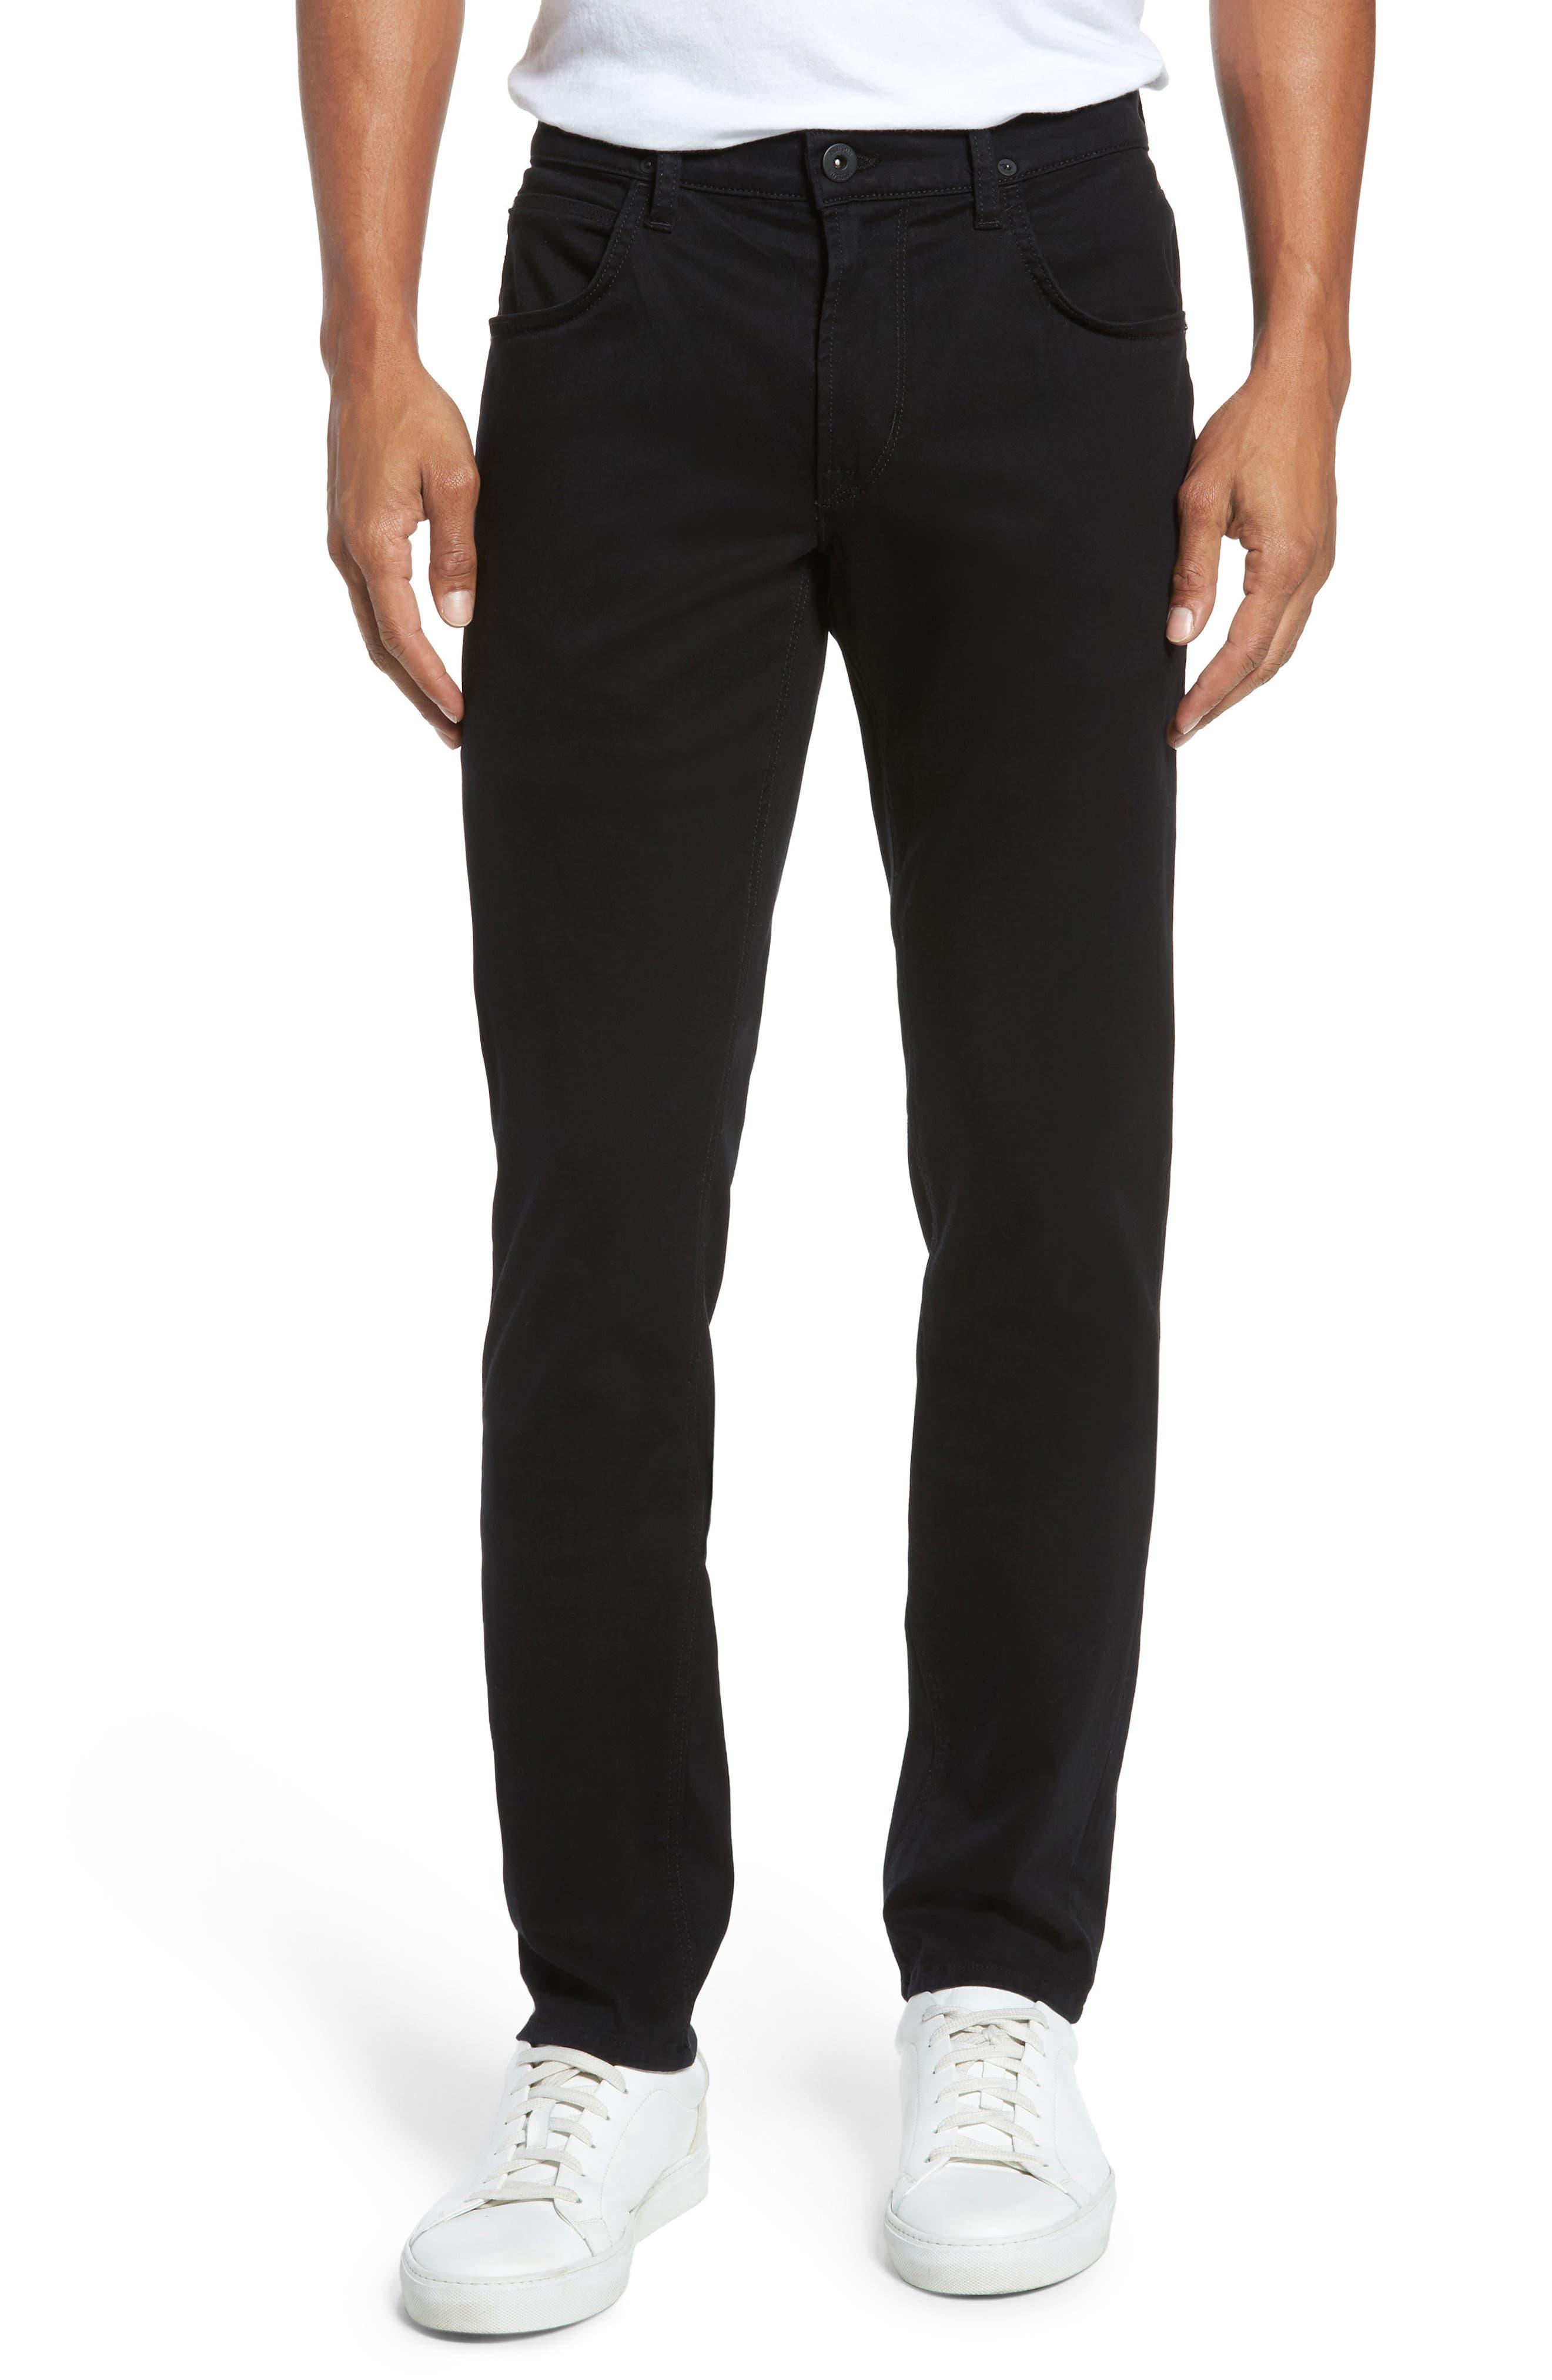 Main Image - Hudson Jeans Blake Slim Fit Jeans (Blackened)